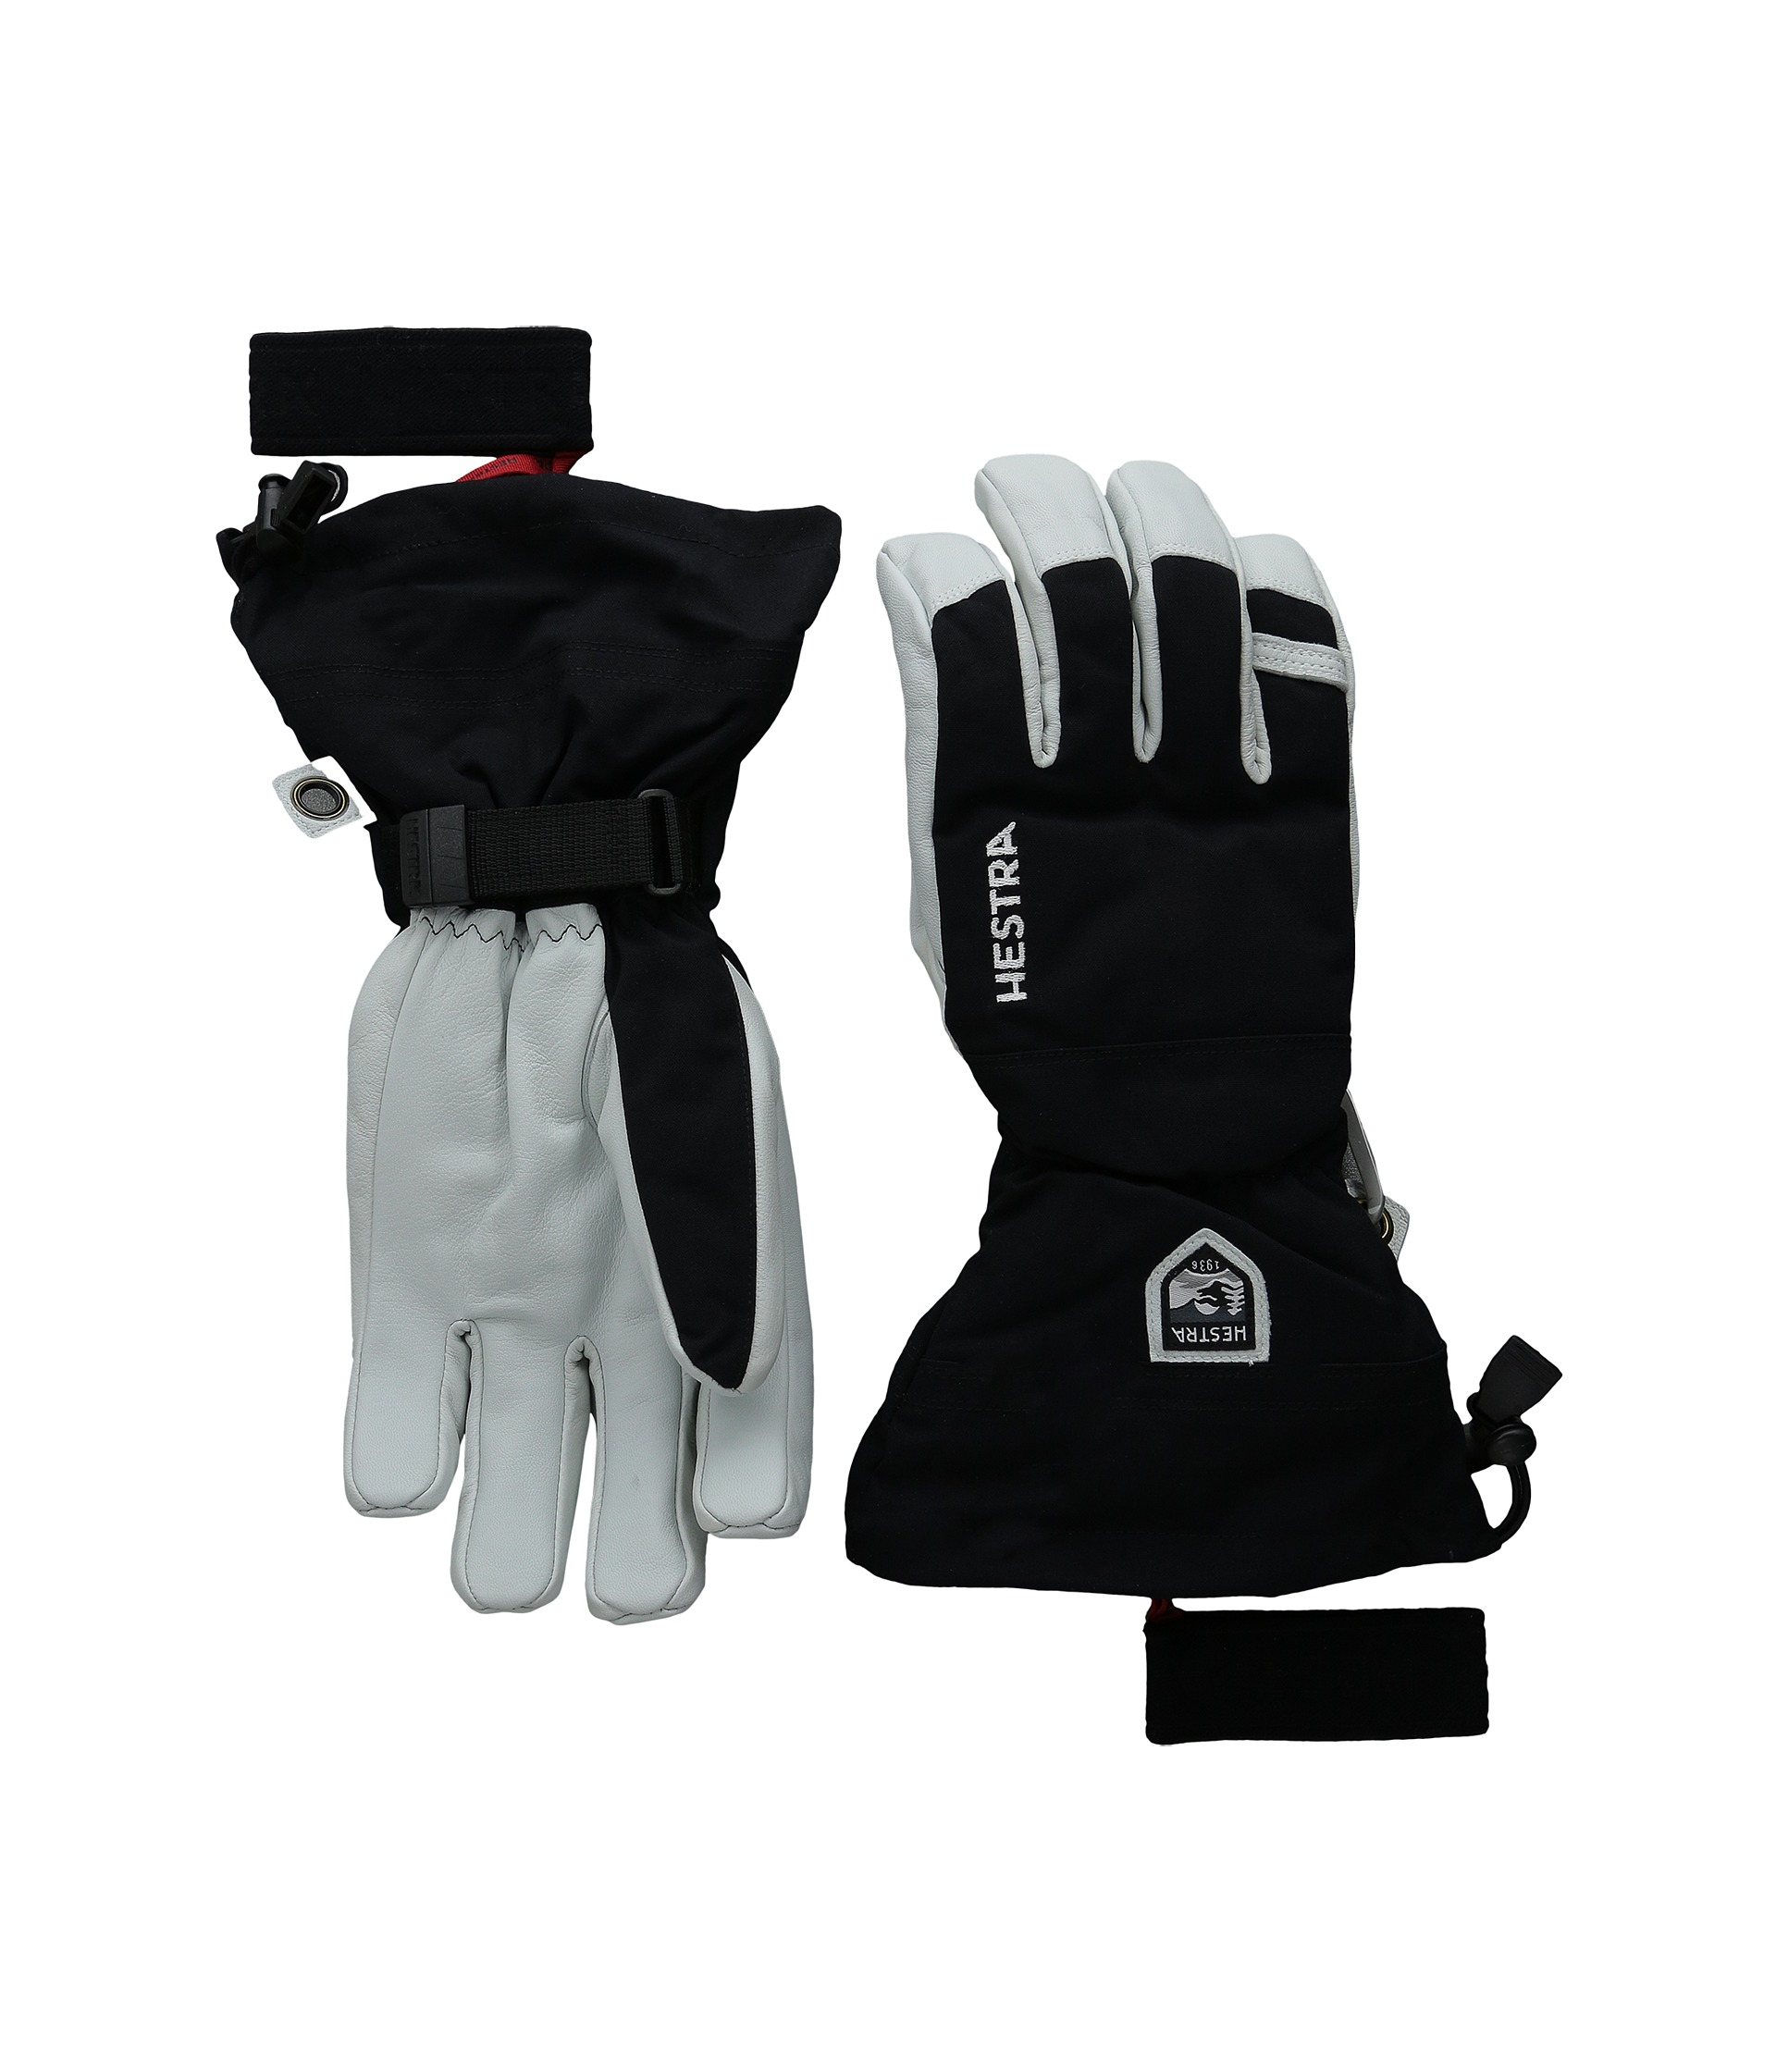 Womens leather ski gloves - Hestra Army Leather Heli Ski